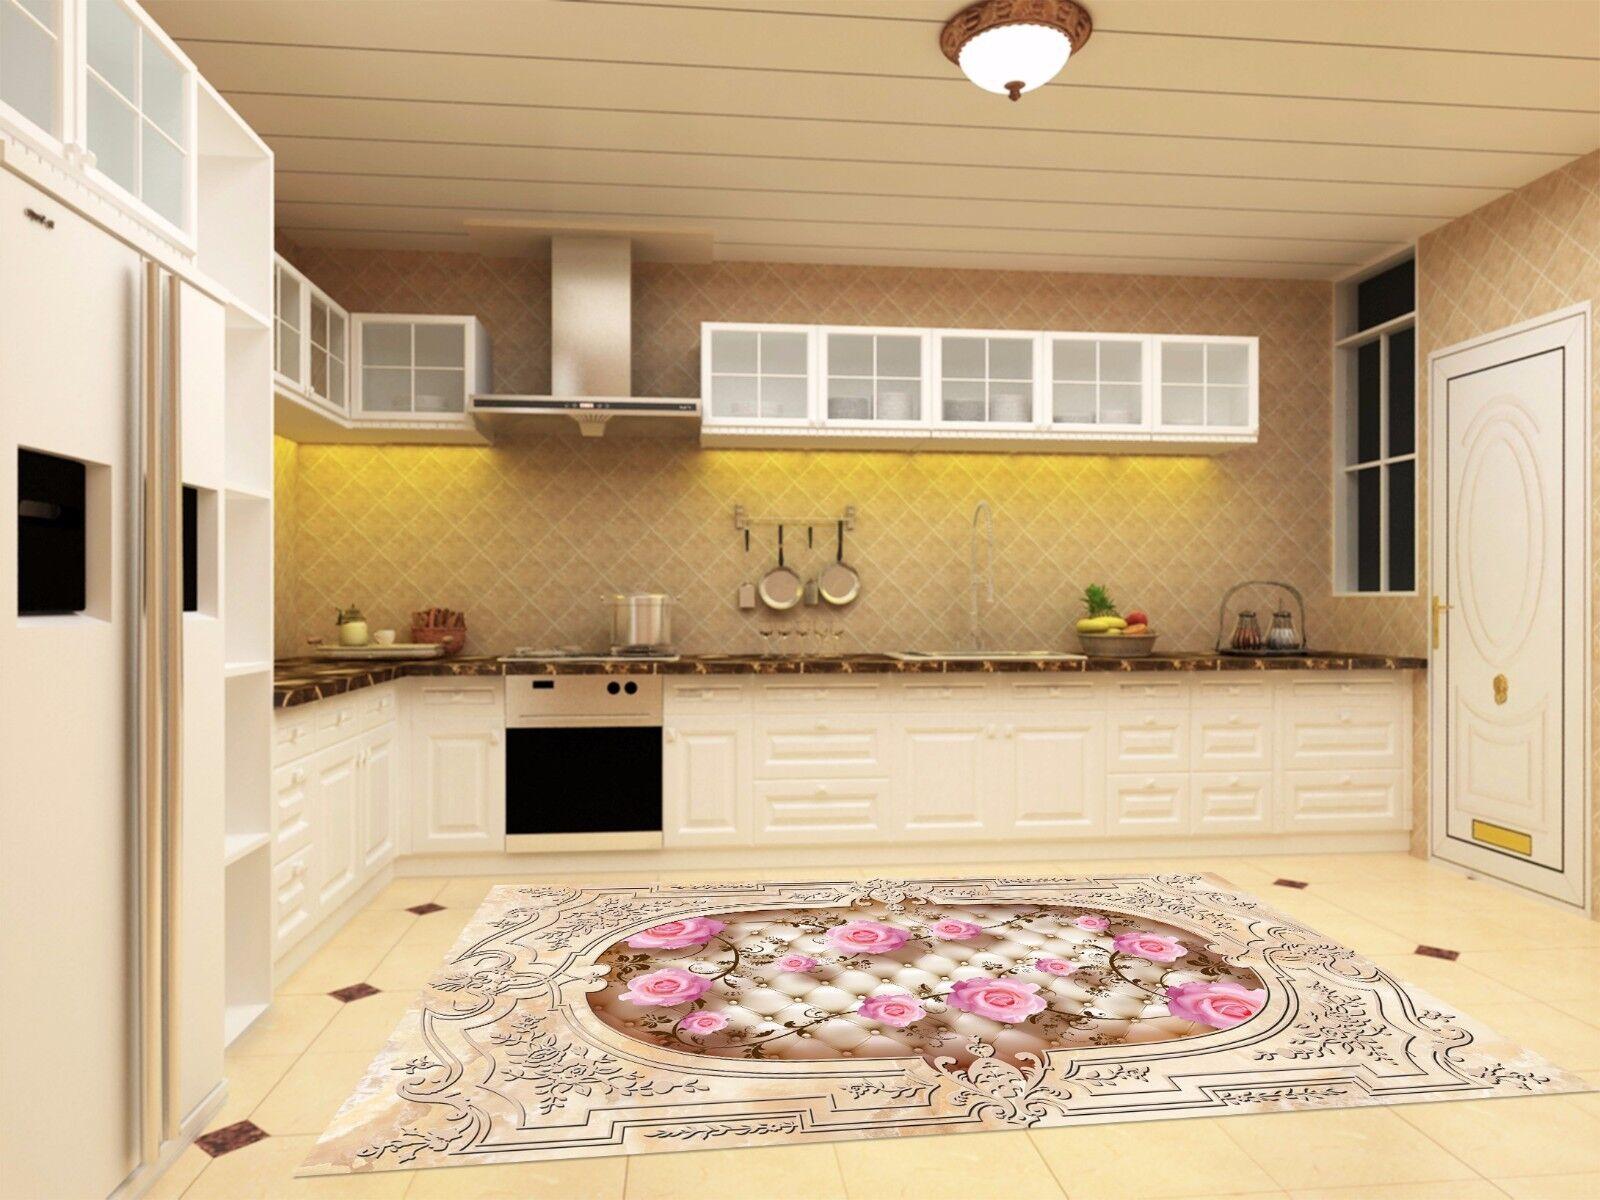 3D Dimensional Pattern 88 Kitchen Mat Floor Murals Wall Print Wall Deco UK Carly